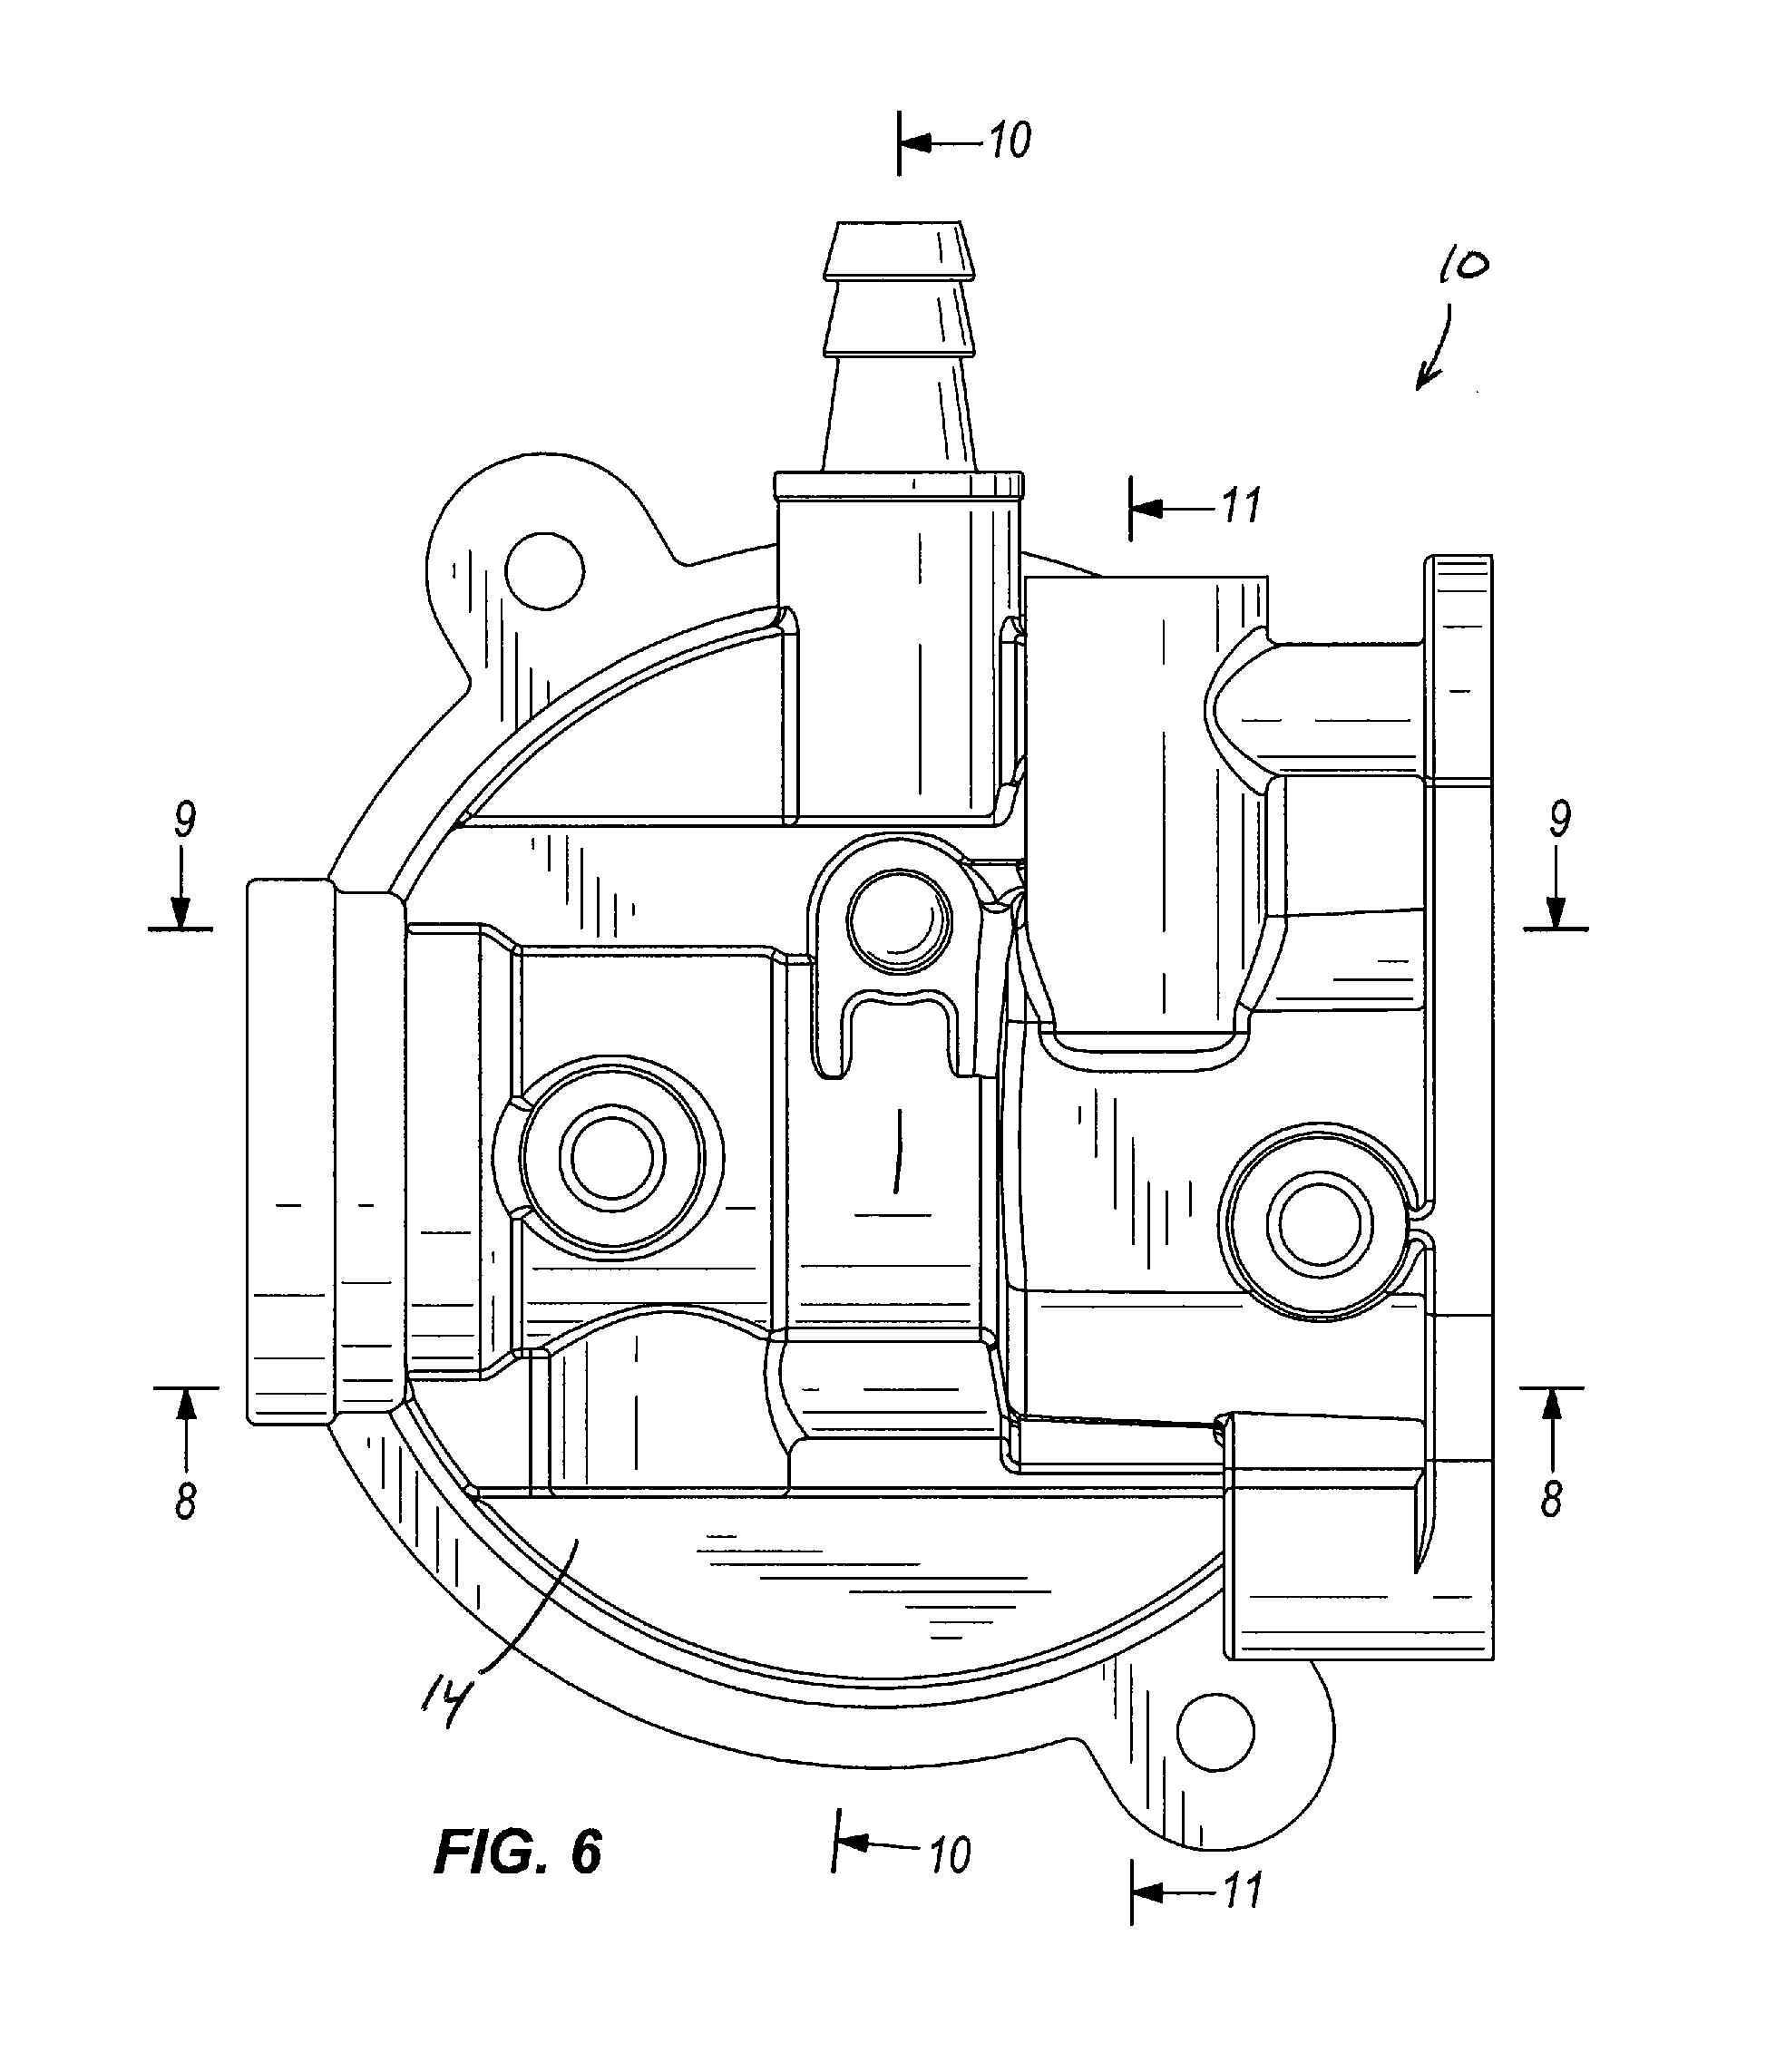 Brevet Us8333366 Carburetor Including One Piece Fuel Metering Zenith Stromberg Parts Diagram Besides Patent Drawing